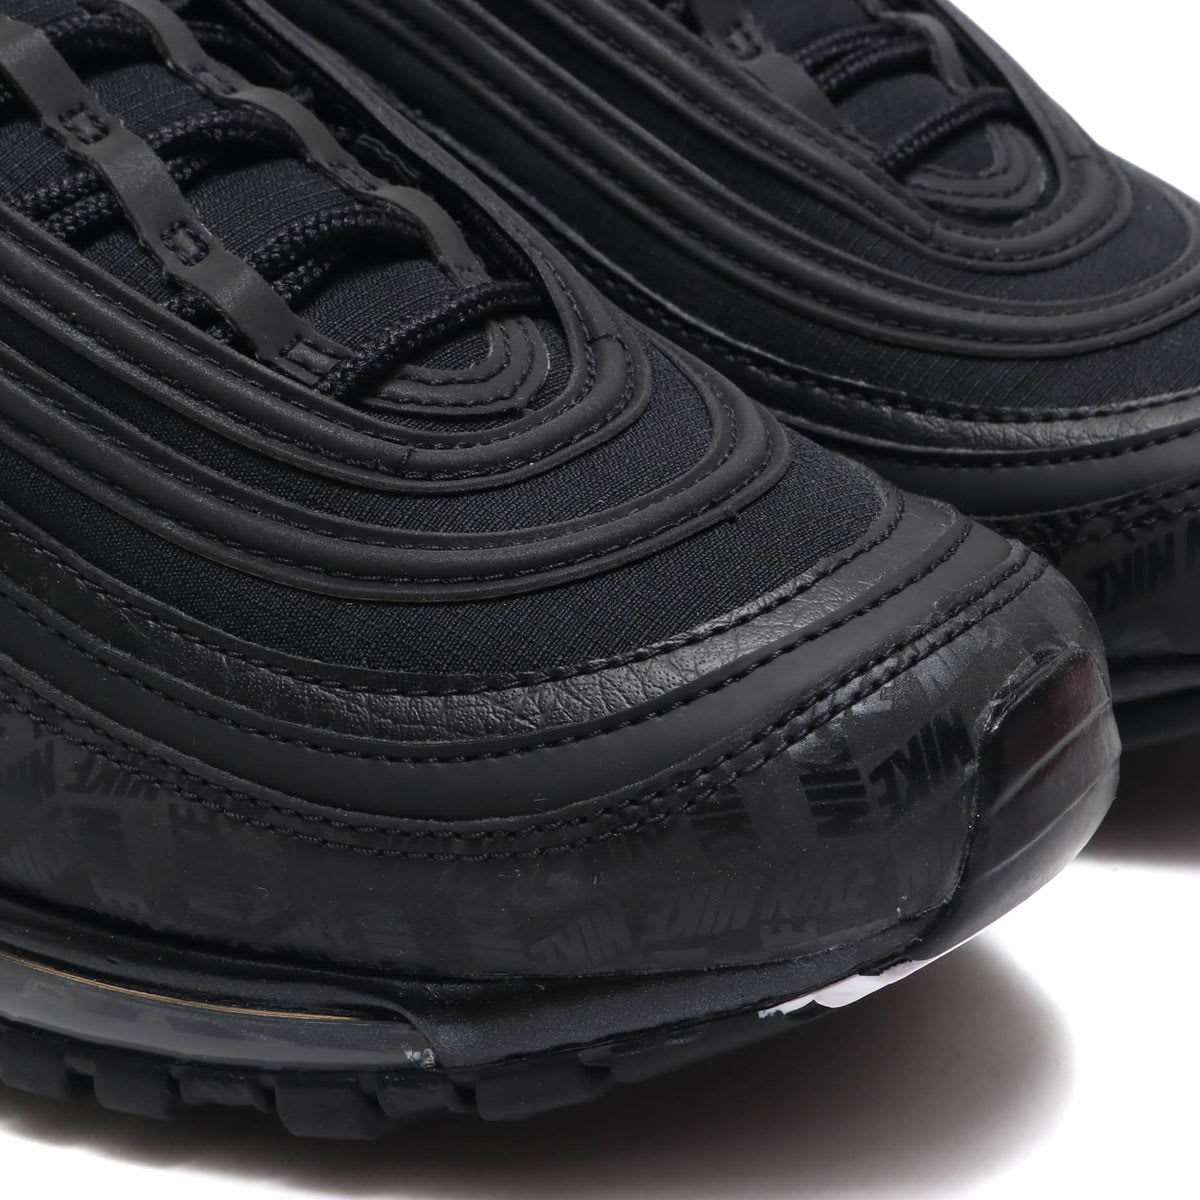 Nike Air Max 97 Black/University Red-Black AR4259-001 (Detail)